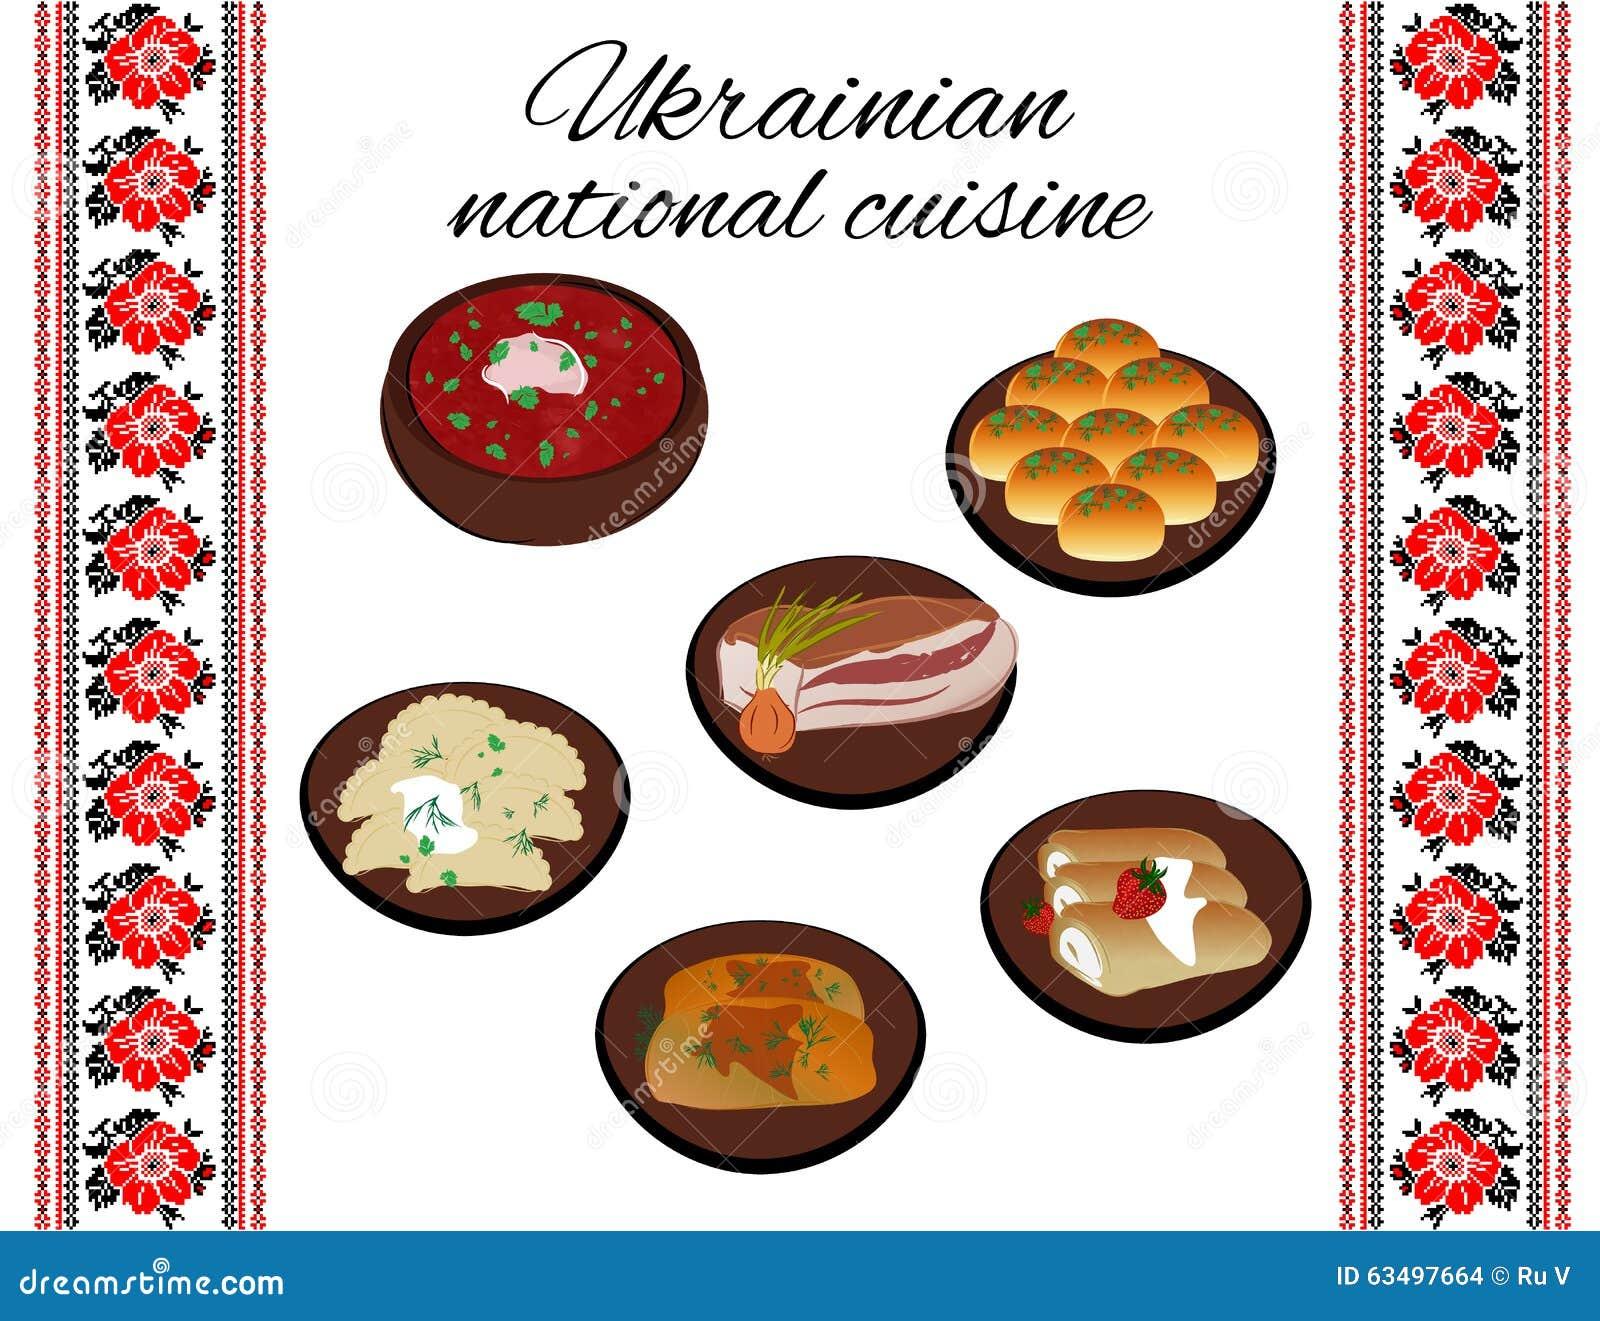 Cuisine nationale ukrainienne